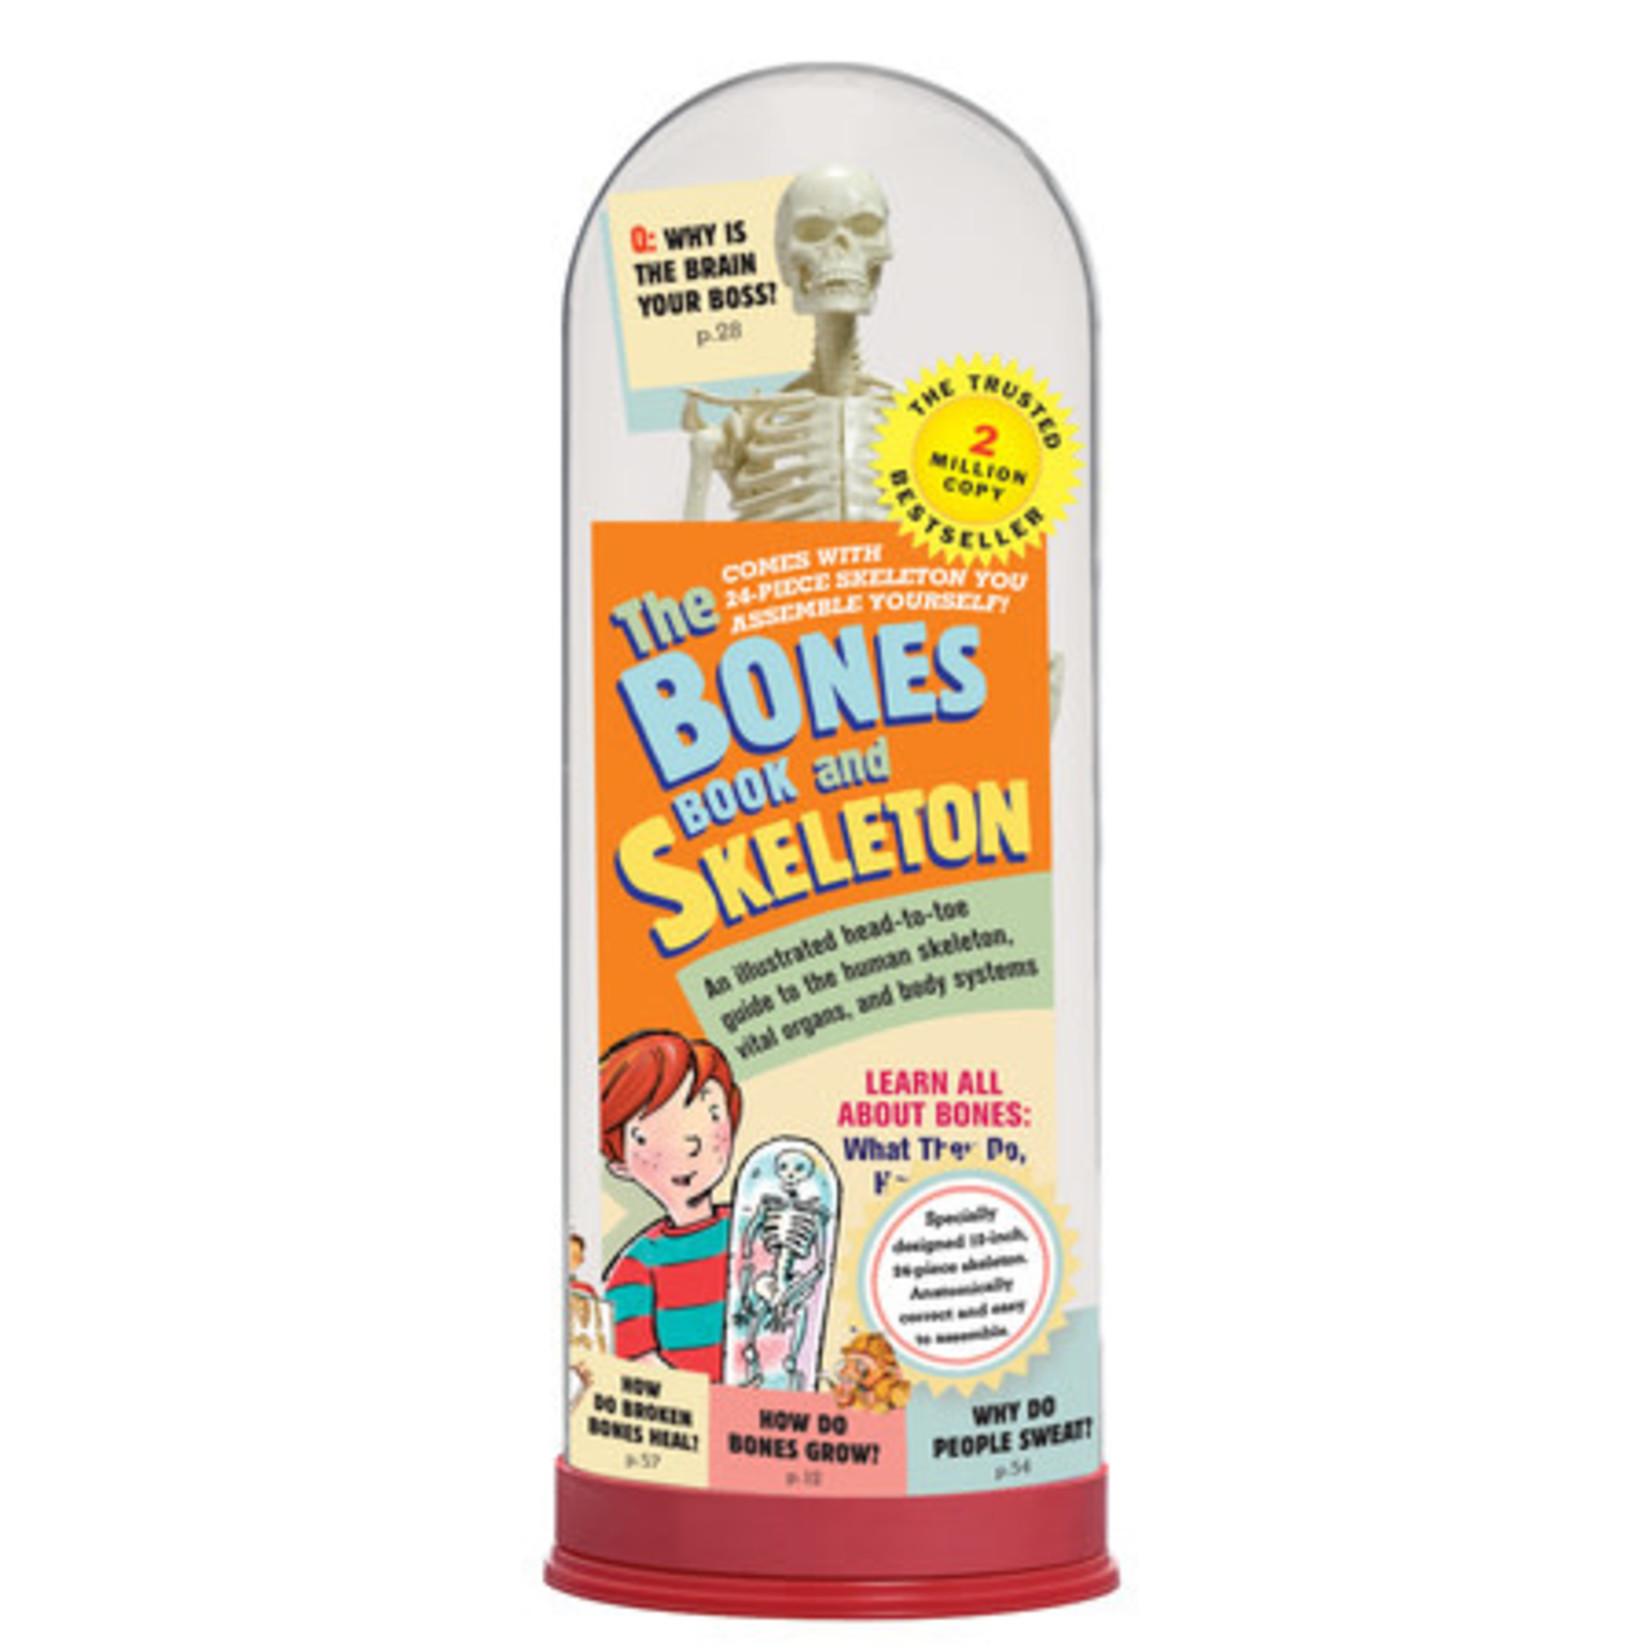 BONES BOOK & SKELETON KIT